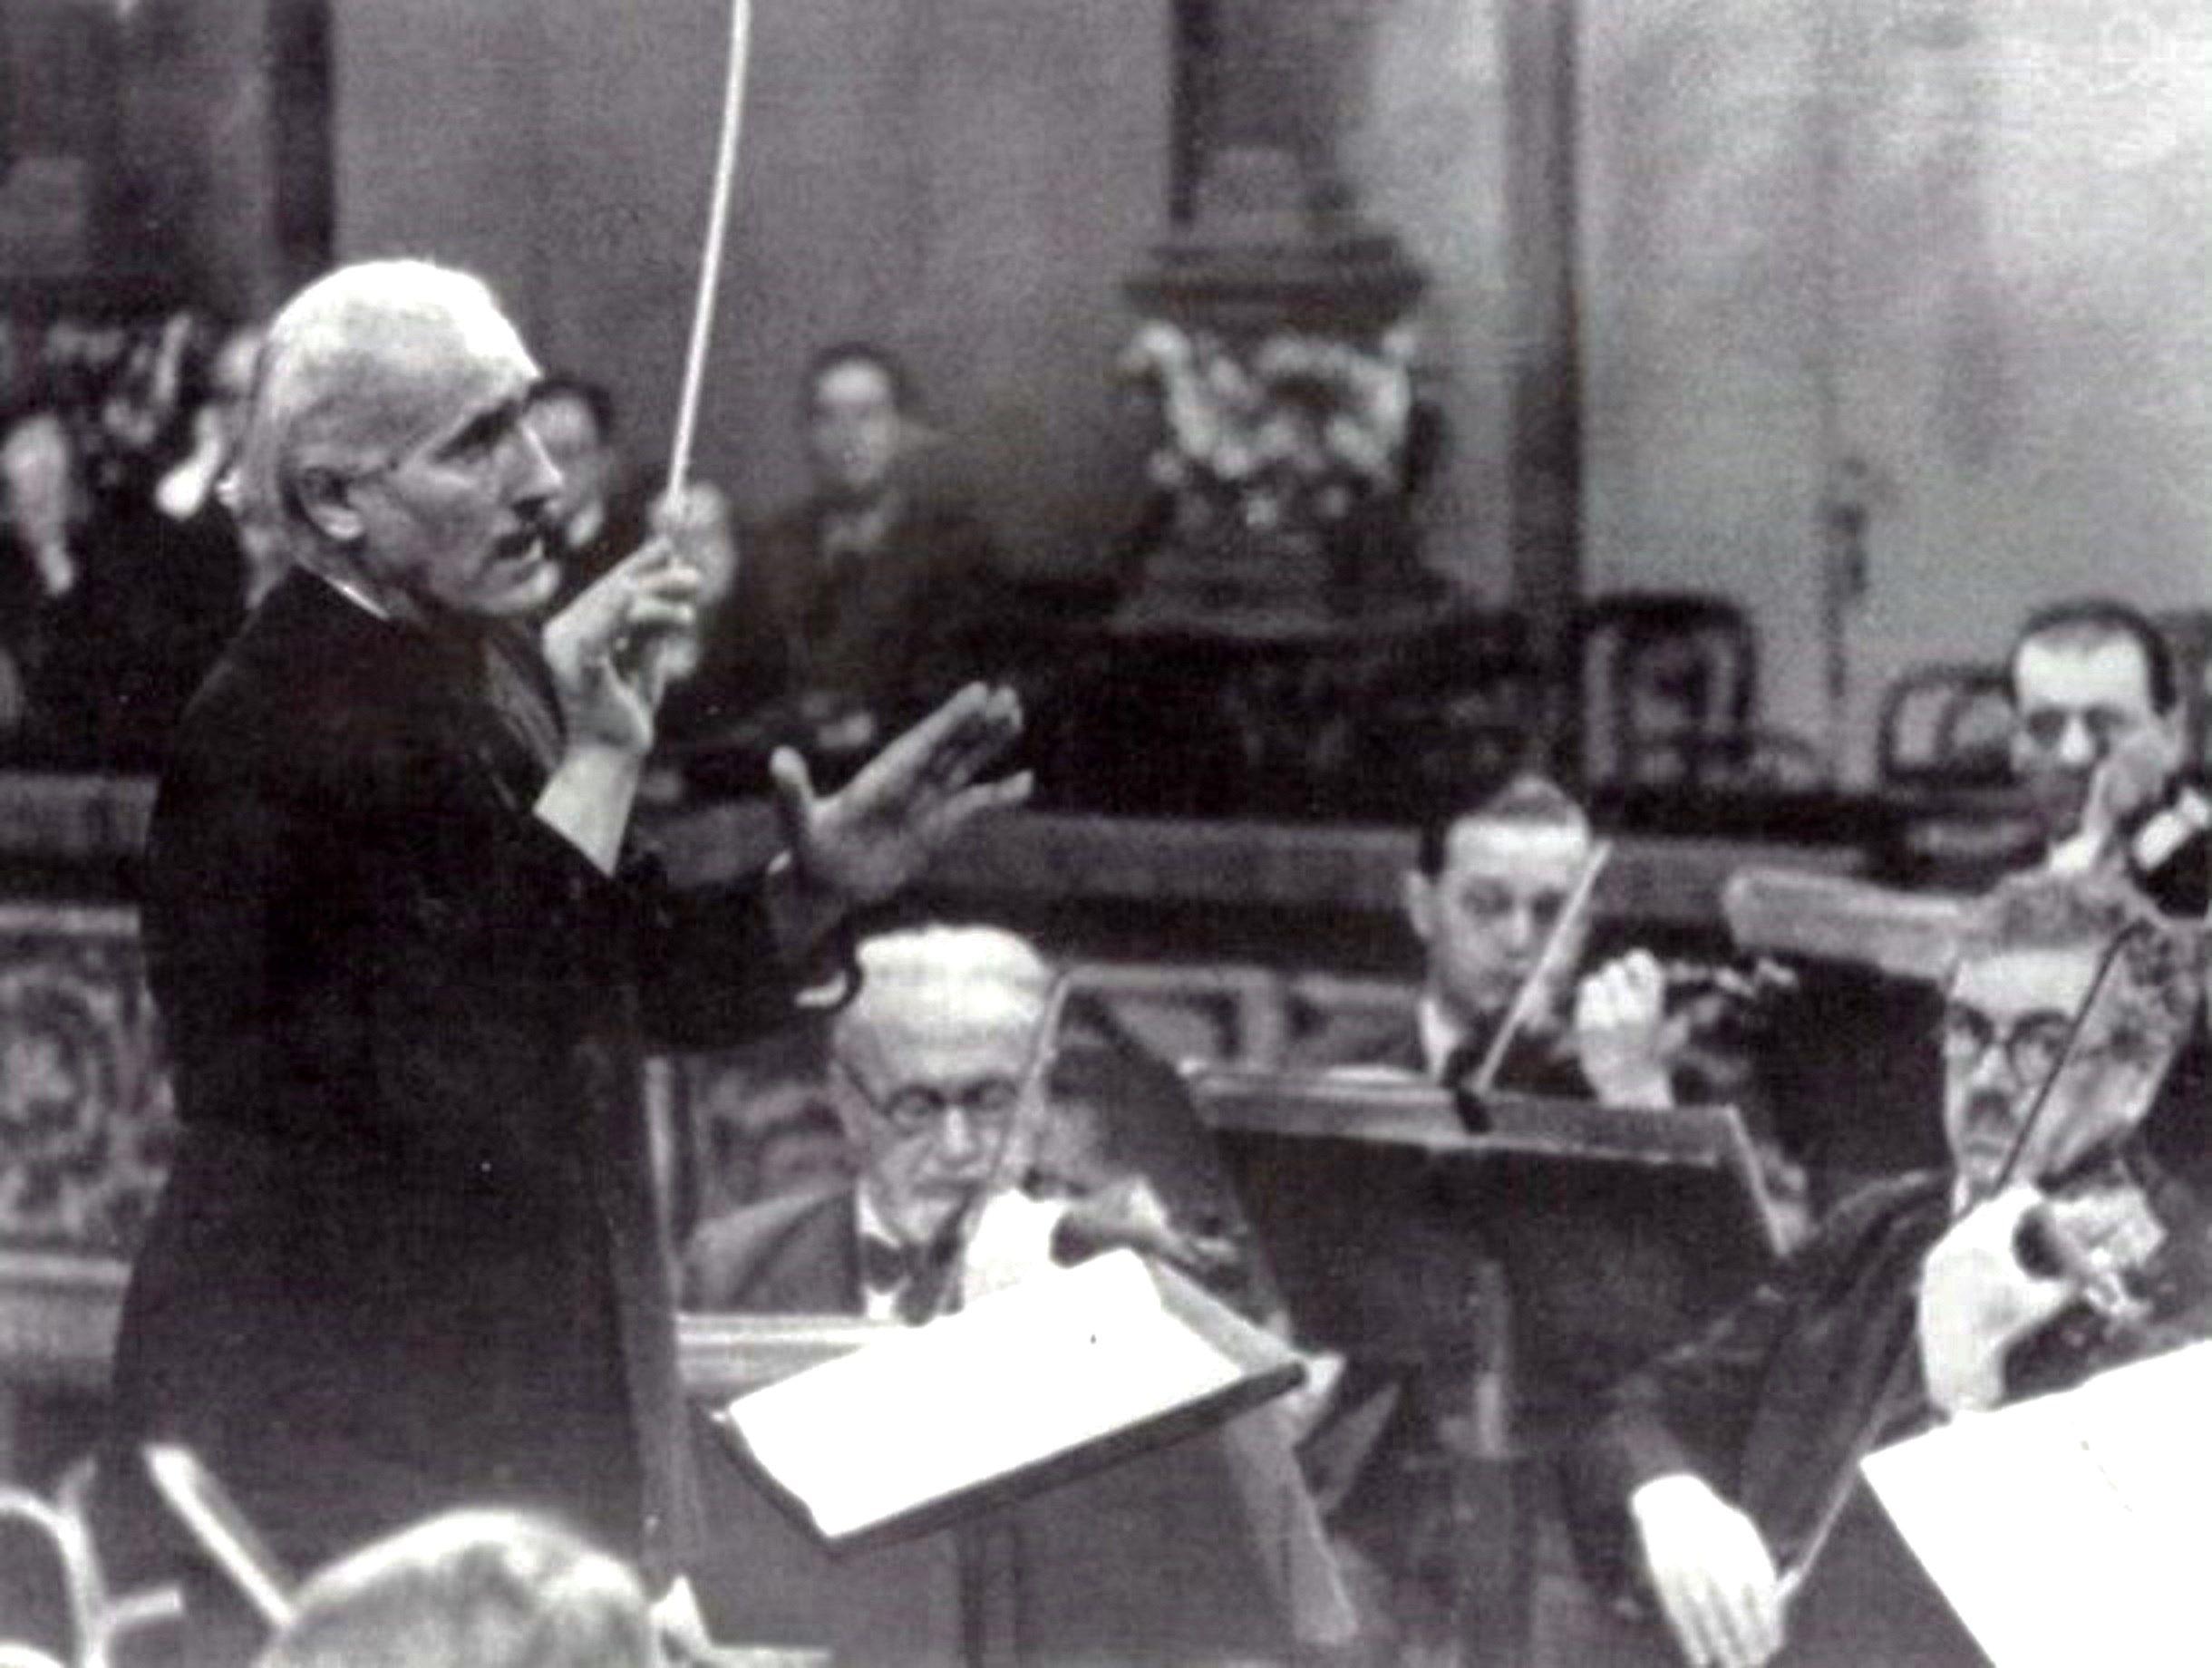 Arturo Toscanini and Wiener Philharmoniker, 1933-1937